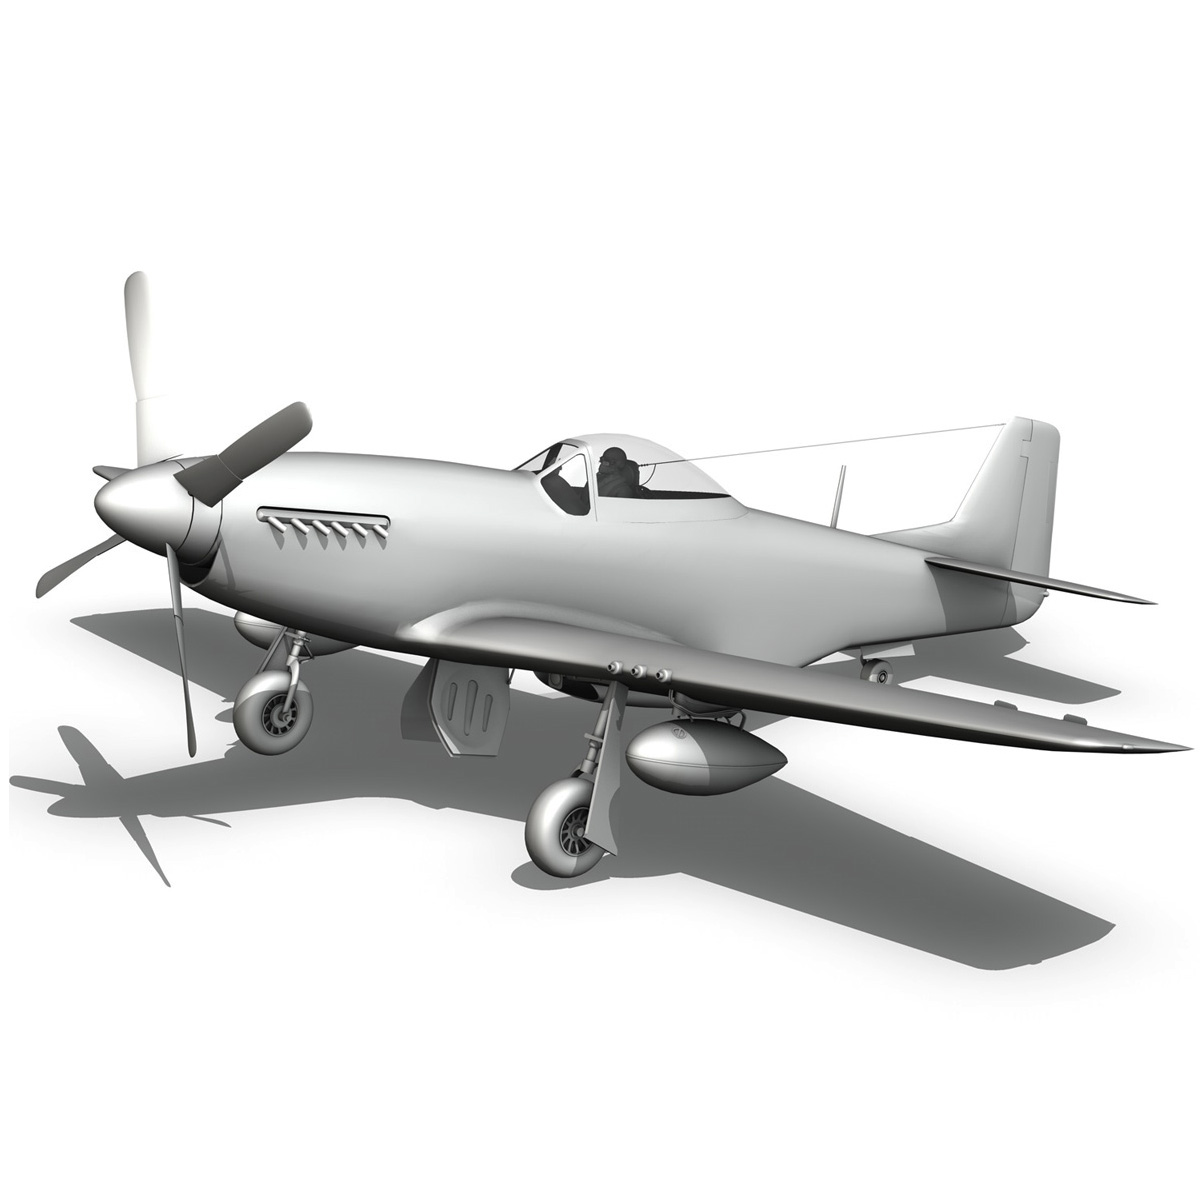 north american p-51d mustang – ferocious frankie 3d model fbx c4d lwo obj 269503